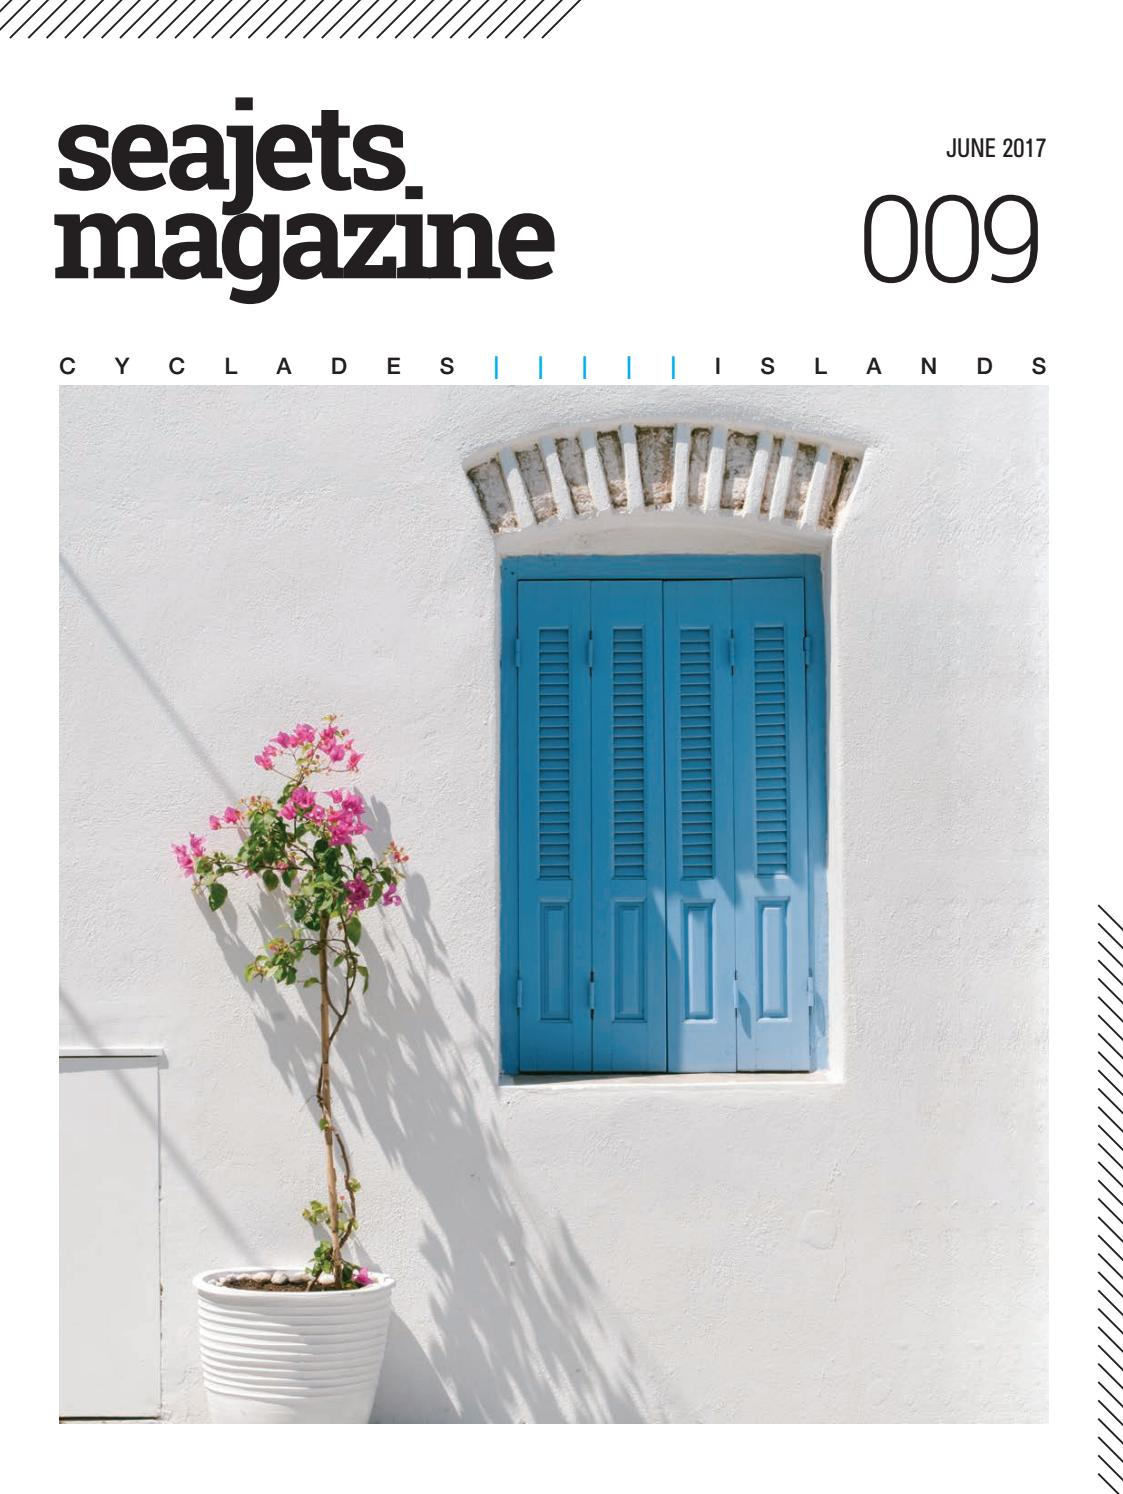 cdbf64cb651b Seajets magazine spring 2017 by PMS ADVERTISING - issuu